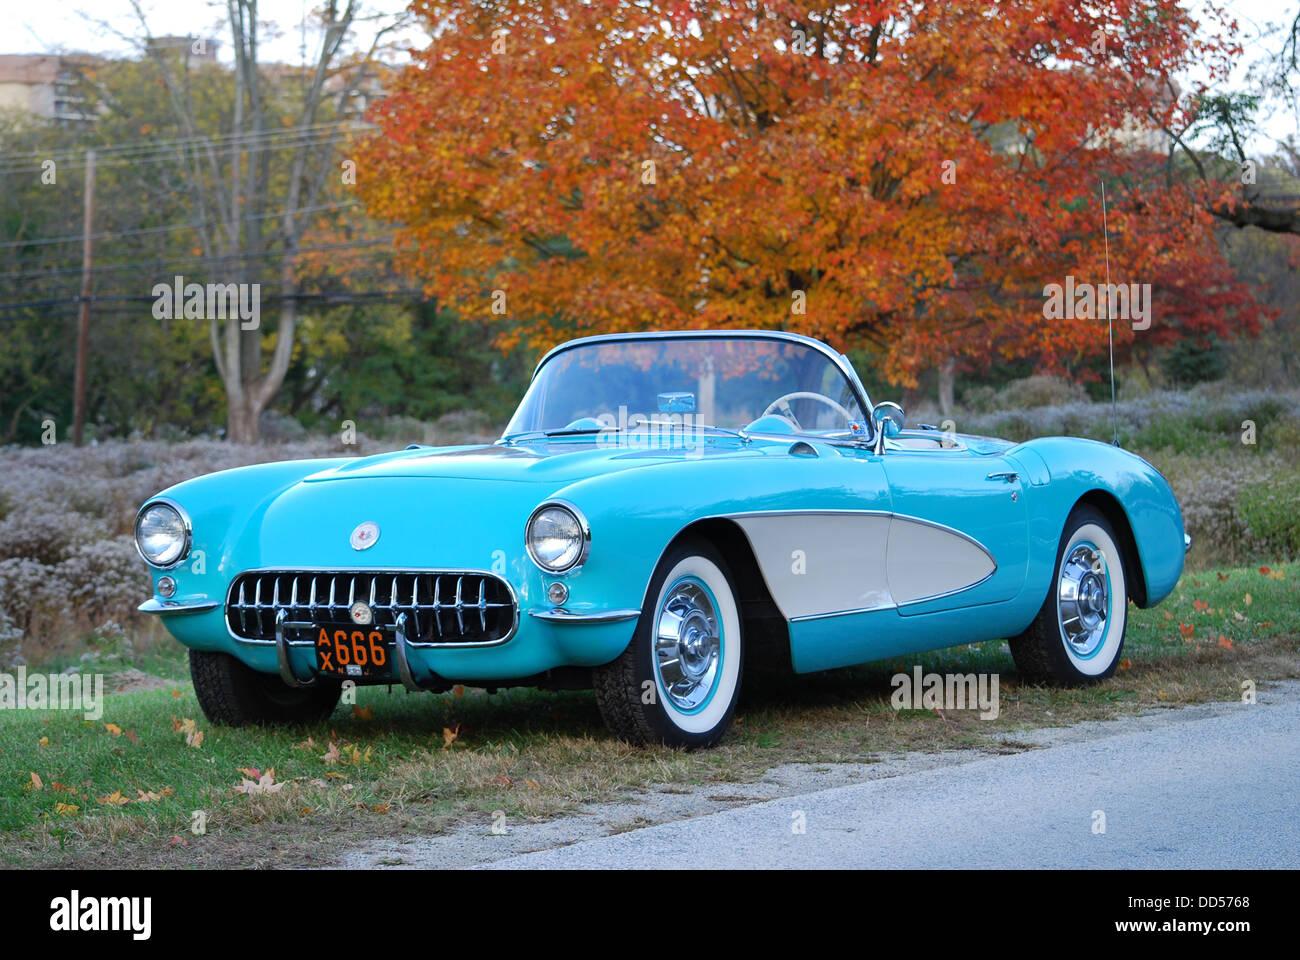 Kelebihan Corvette 1958 Harga